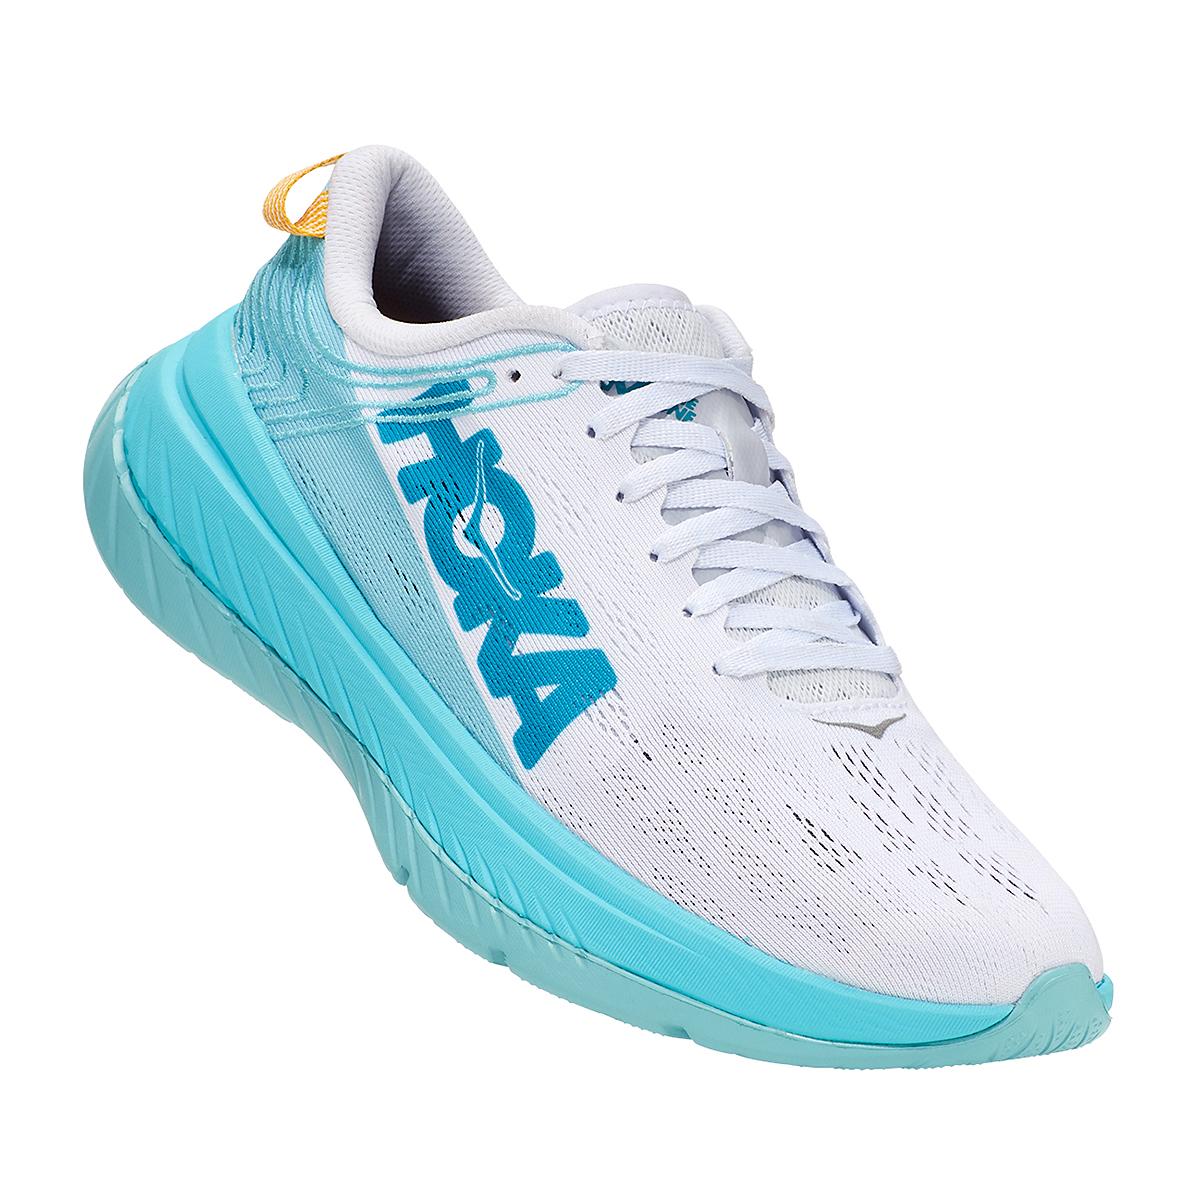 Women's Hoka One One Carbon X Running Shoe - Color: White/Angel Blue - Size: 5 - Width: Regular, White/Angel Blue, large, image 3